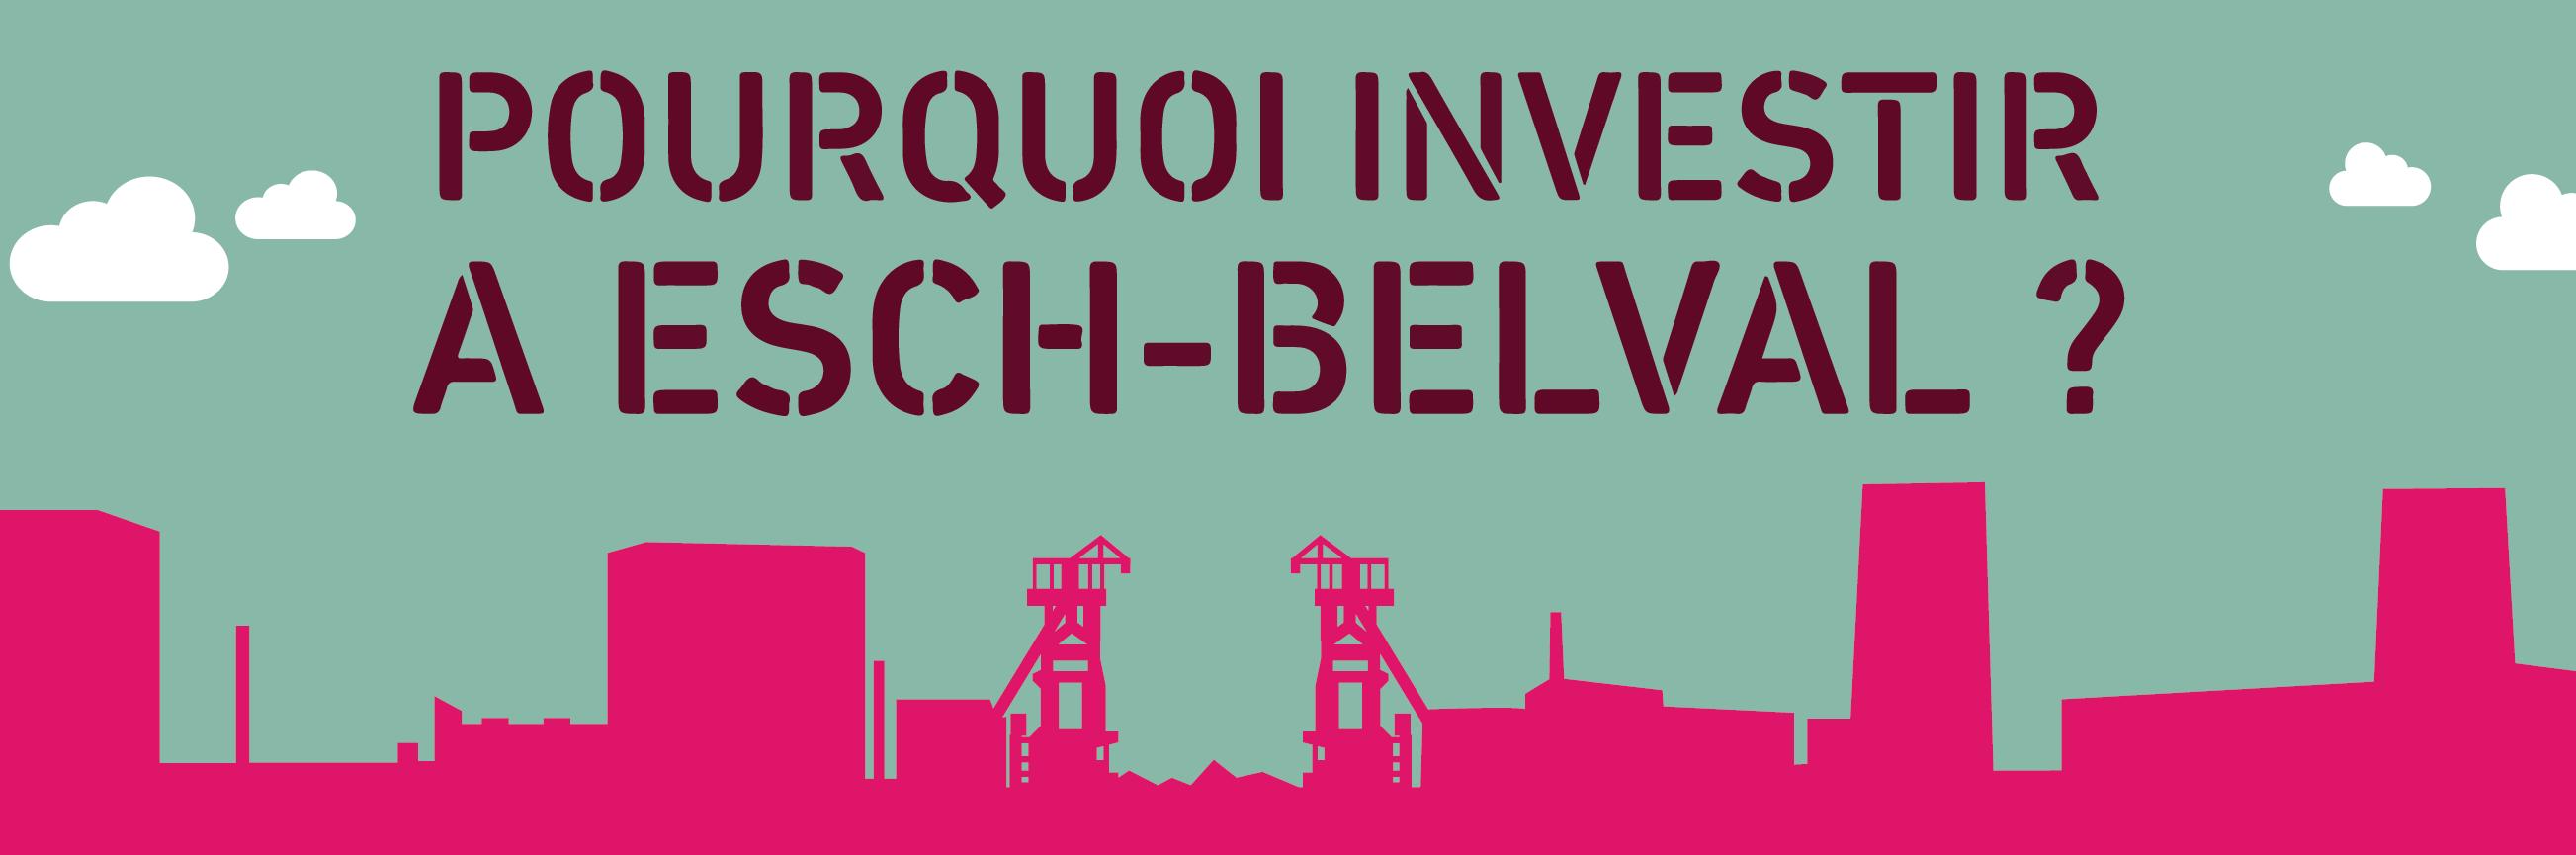 Image de Pourquoi investir à Esch-Beval ?